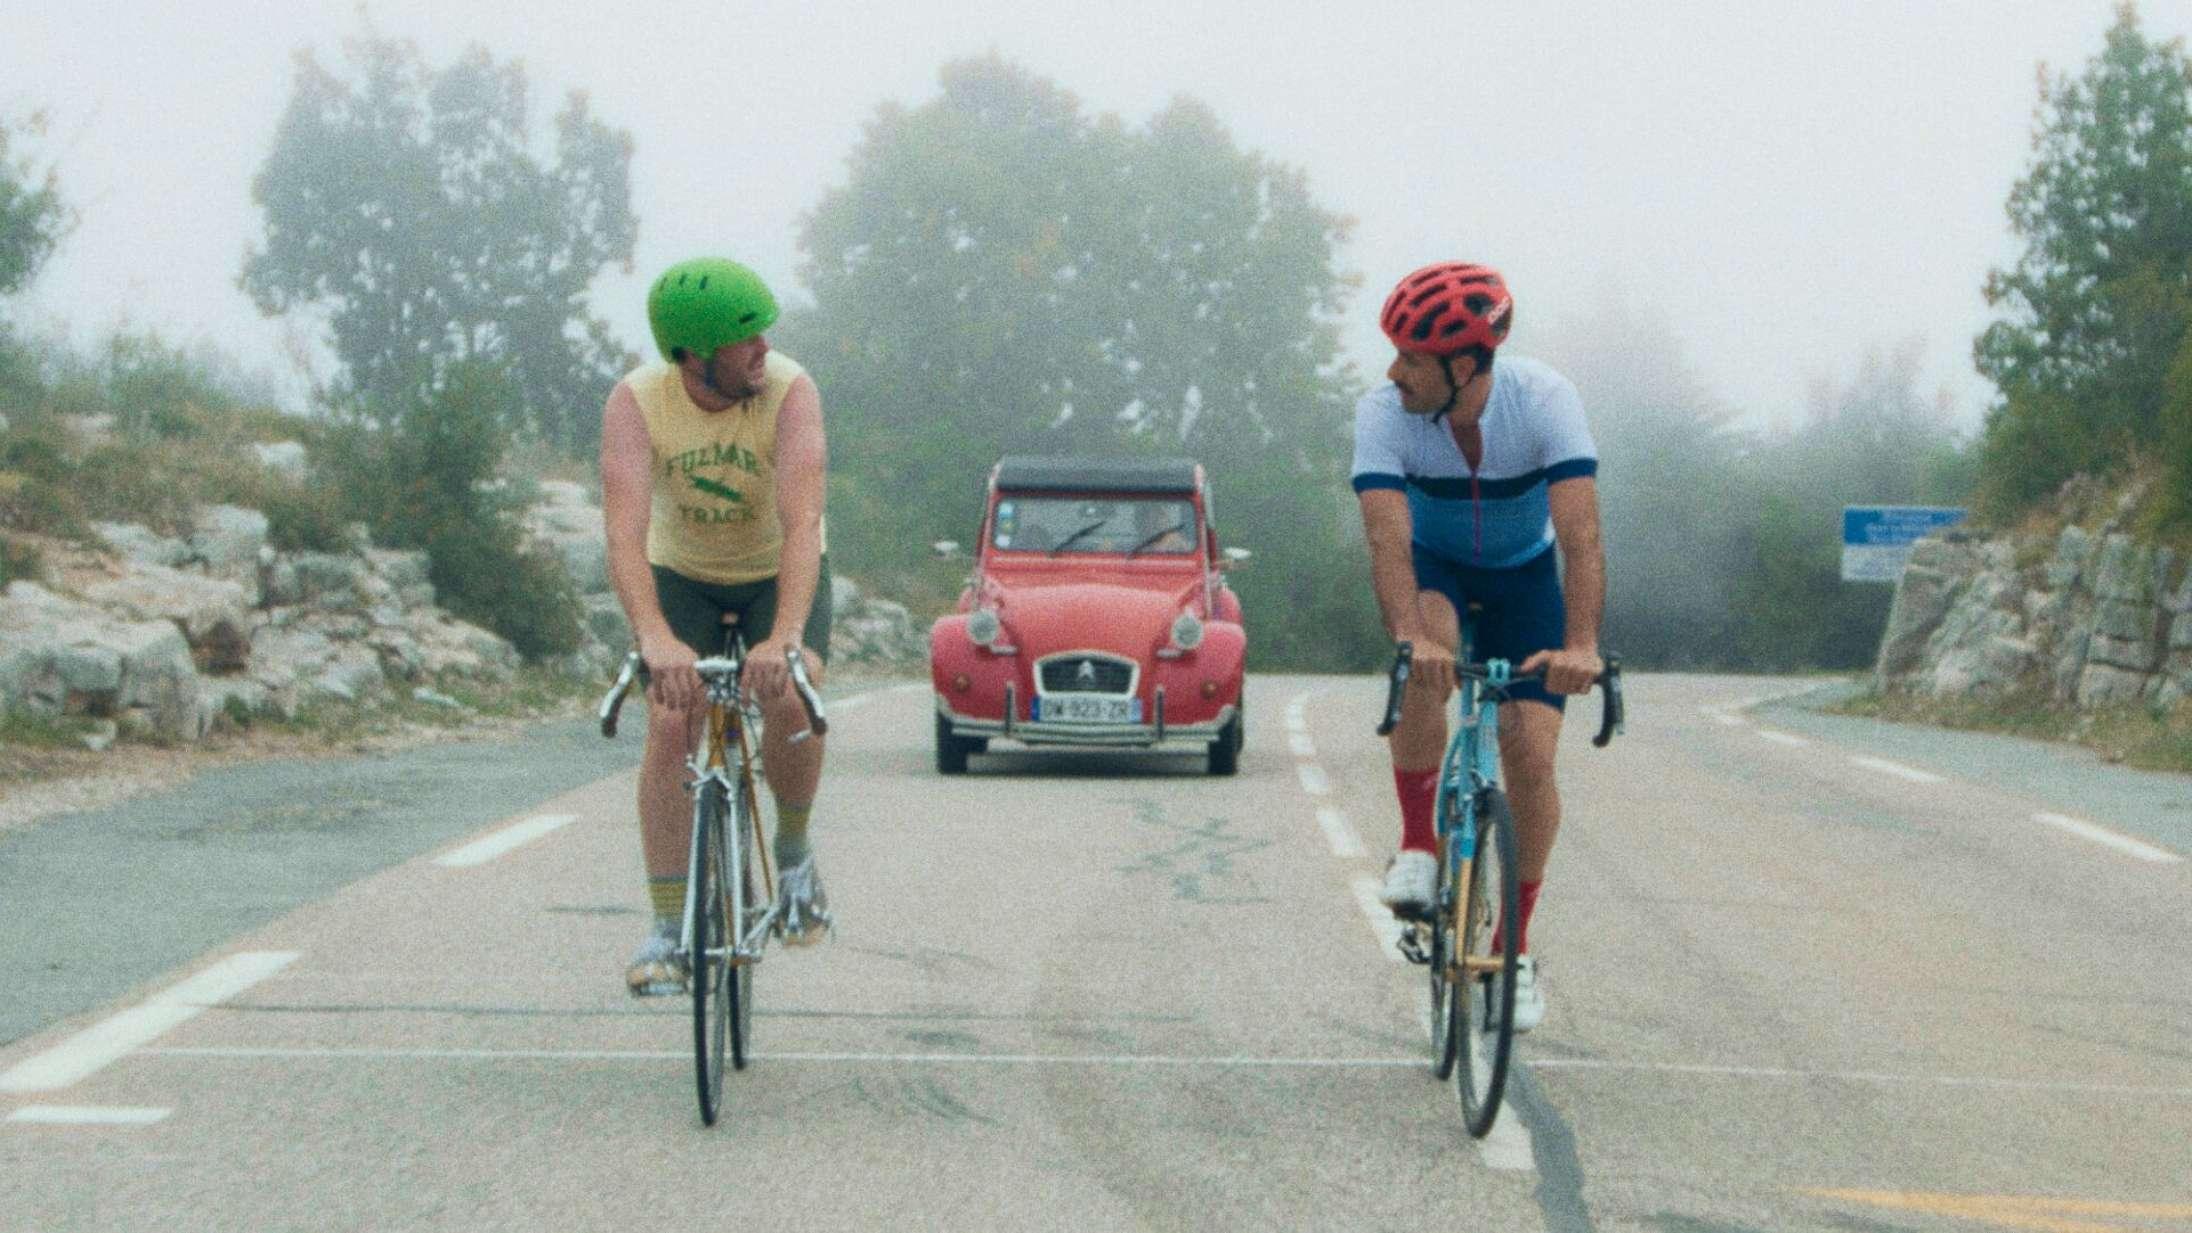 'The Climb': Indie-dramedyens 'The Revenant' skulle være blevet på cyklen